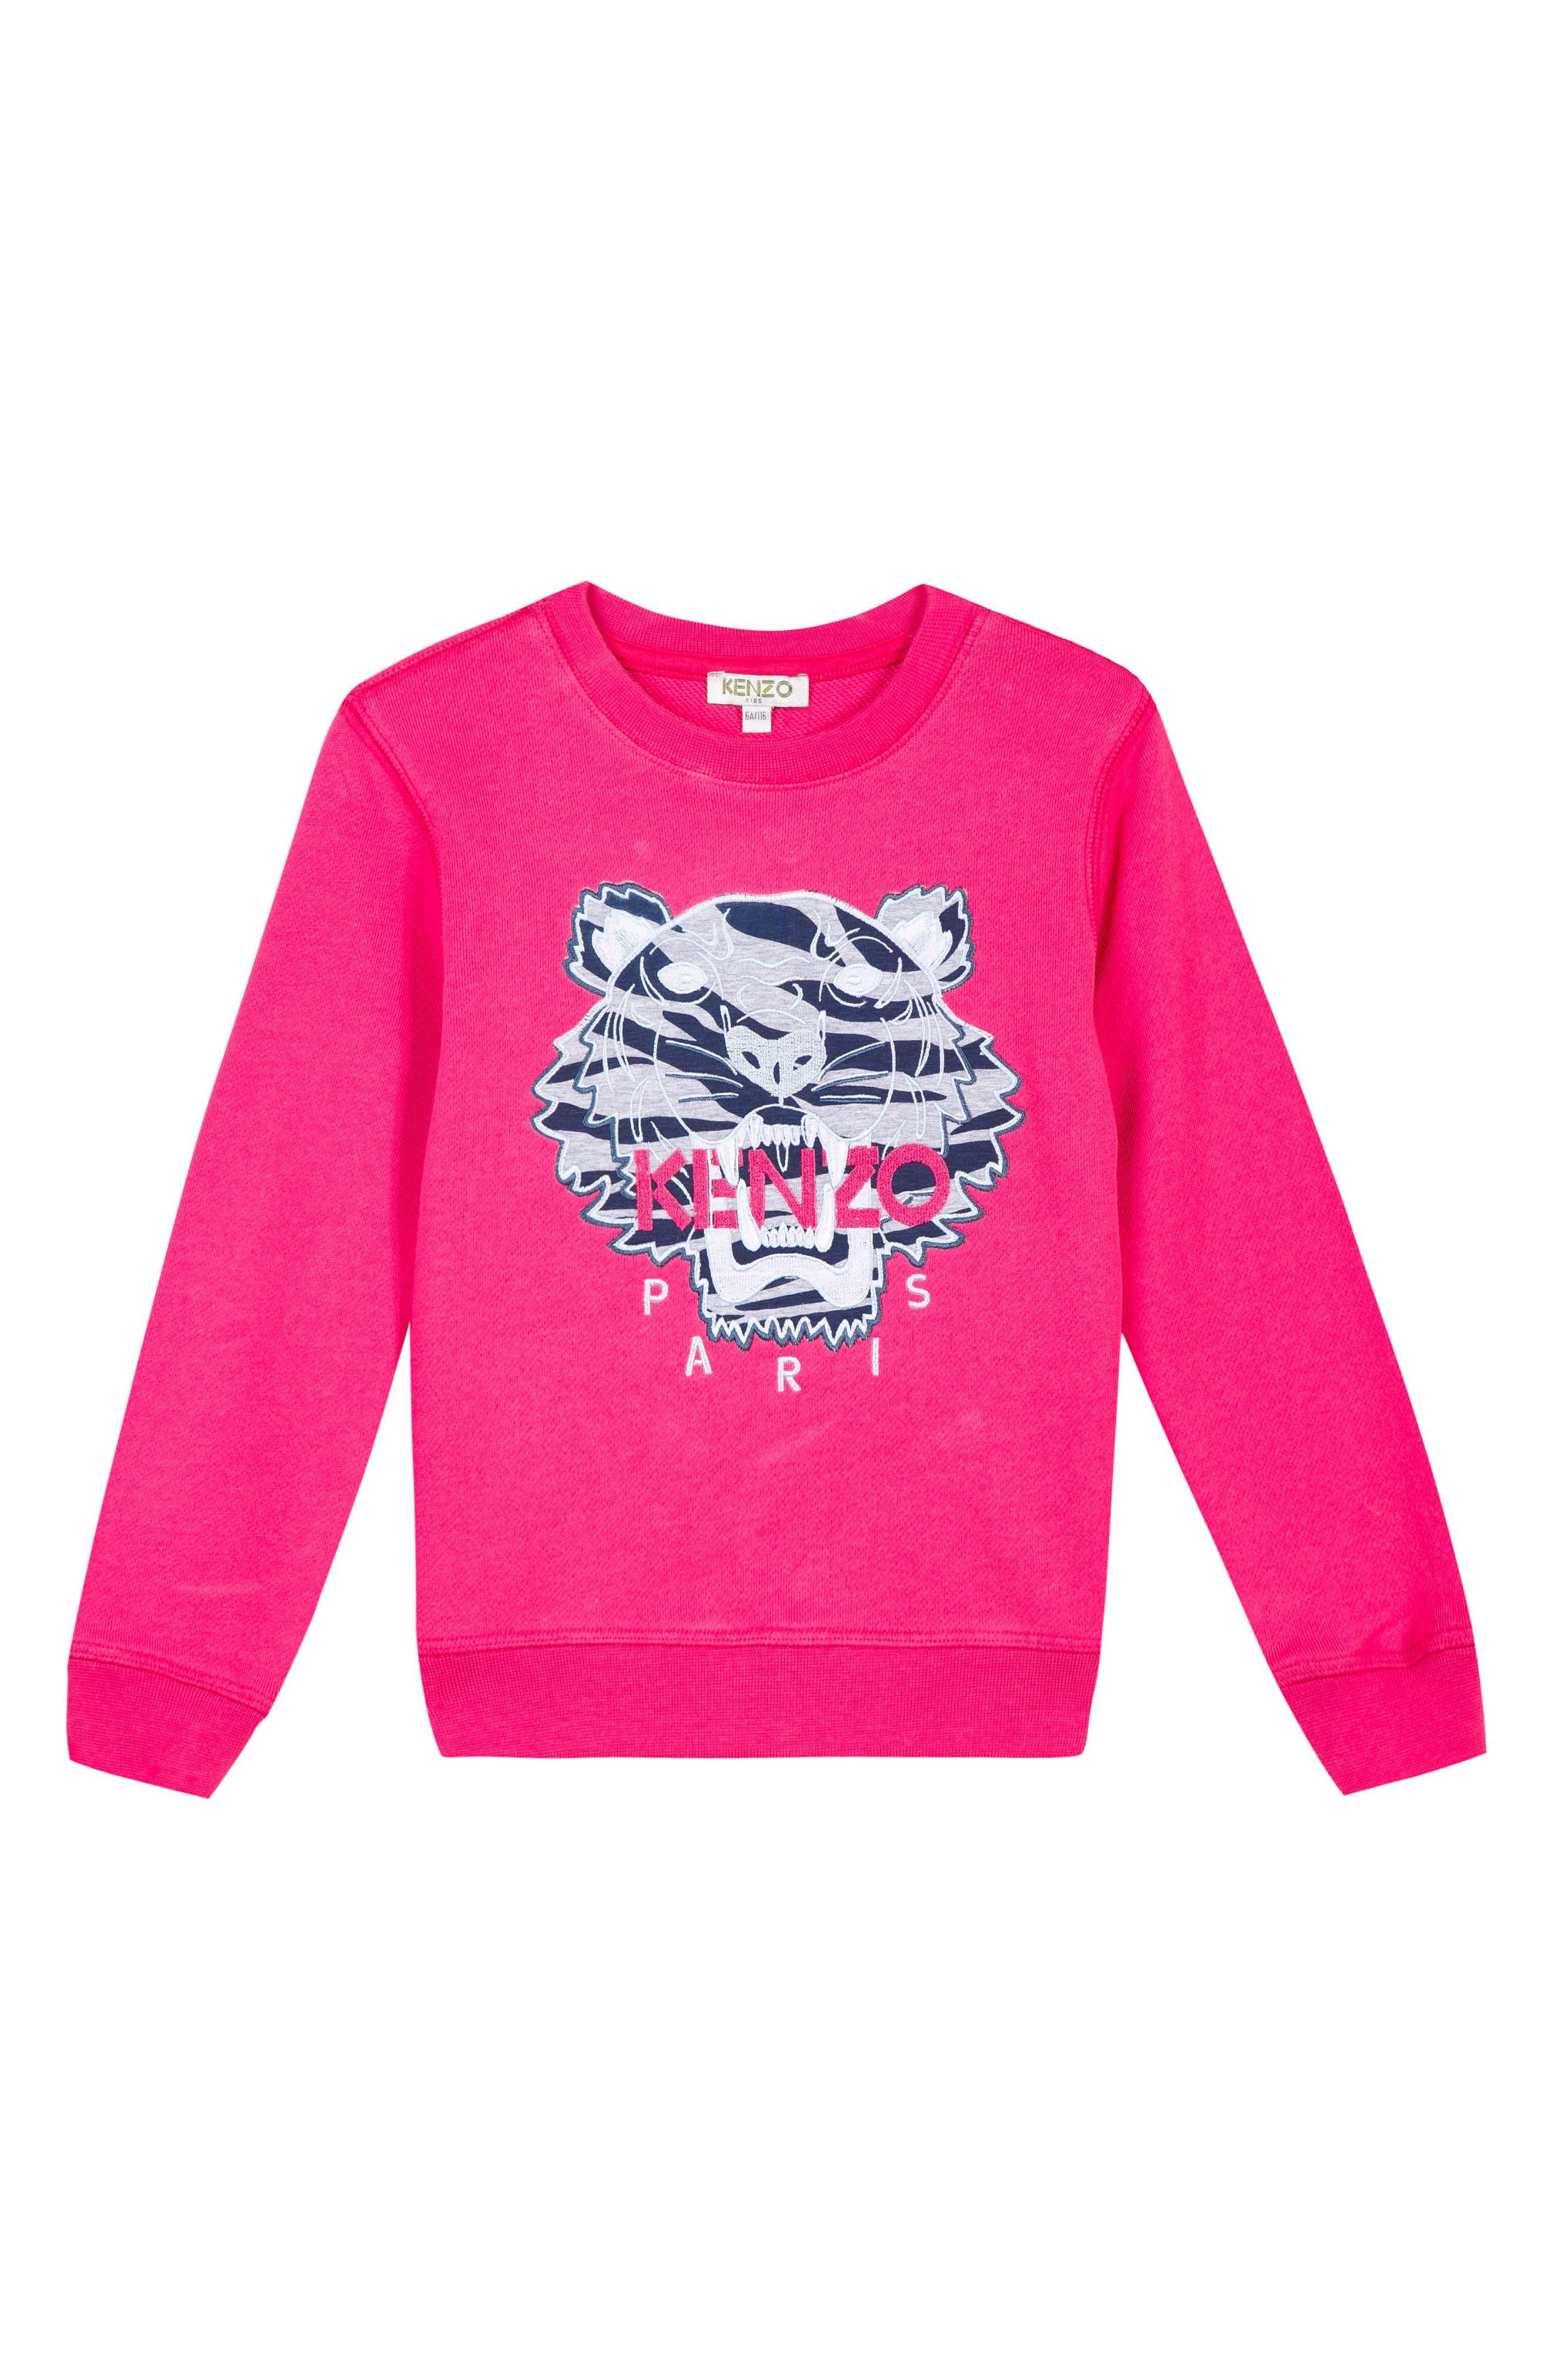 Girls Kenzo Embroidered Tiger Logo Sweatshirt Size 10Y  Pink